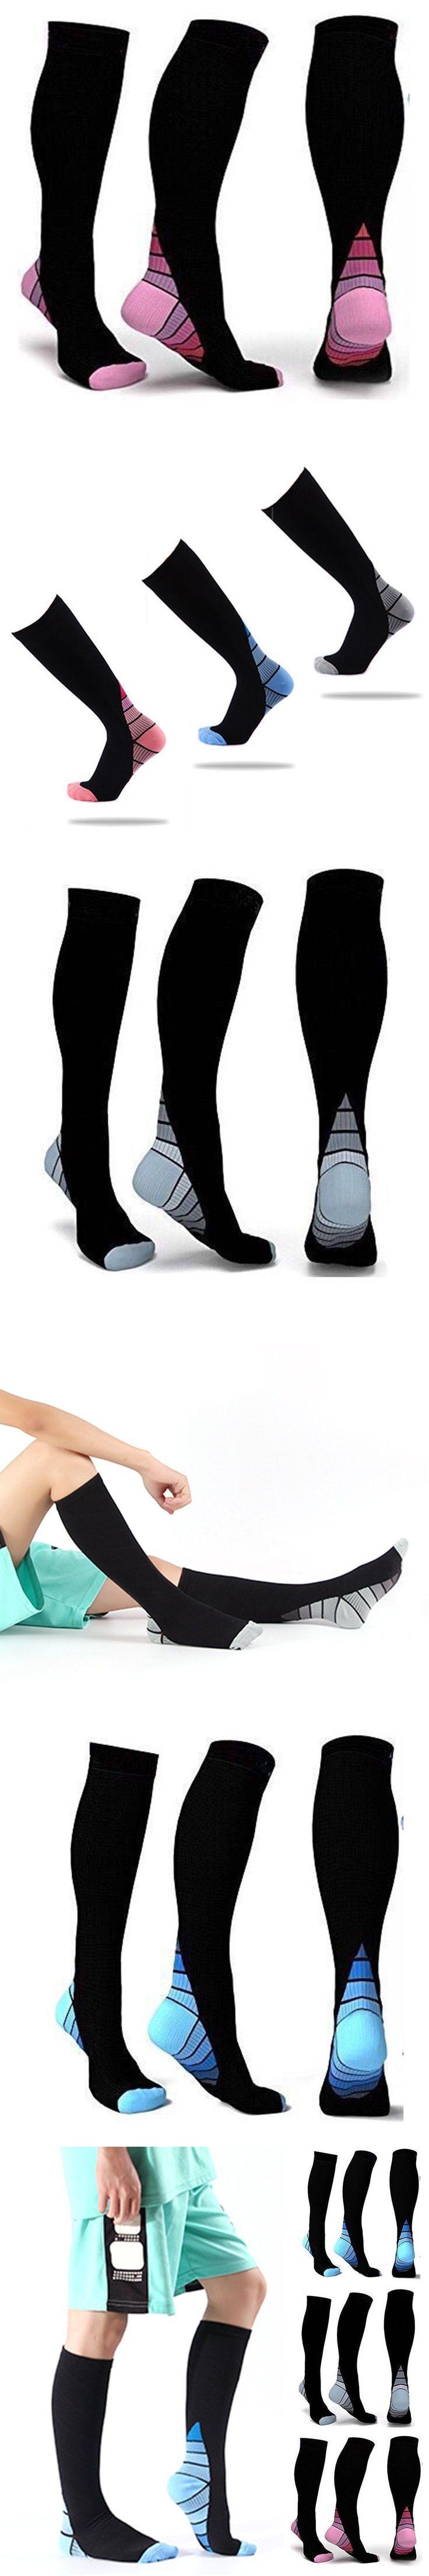 HIRIGIN Newest Men's Women's Compression Socks Pain Relief Graduated Support Stockings L/XL